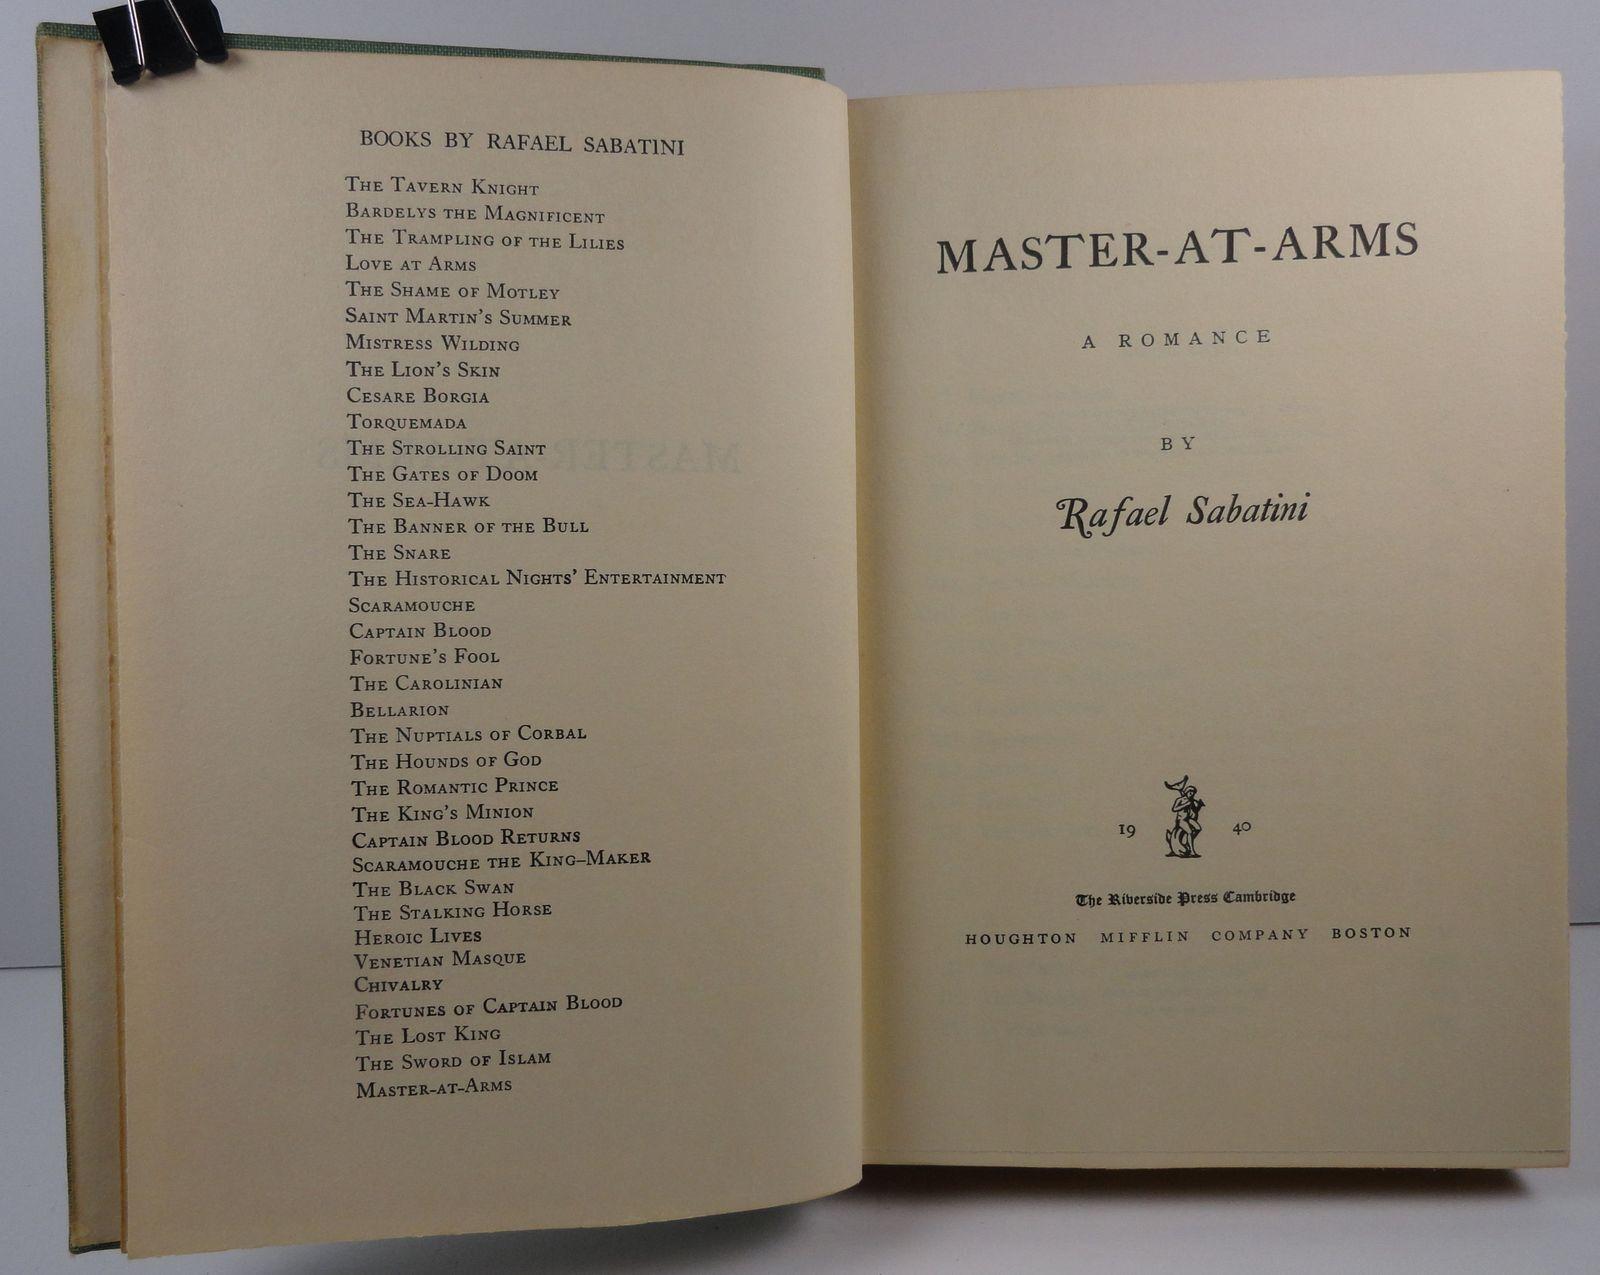 Master At Arms by Rafael Sabatini 1940 Houghton Mifflin